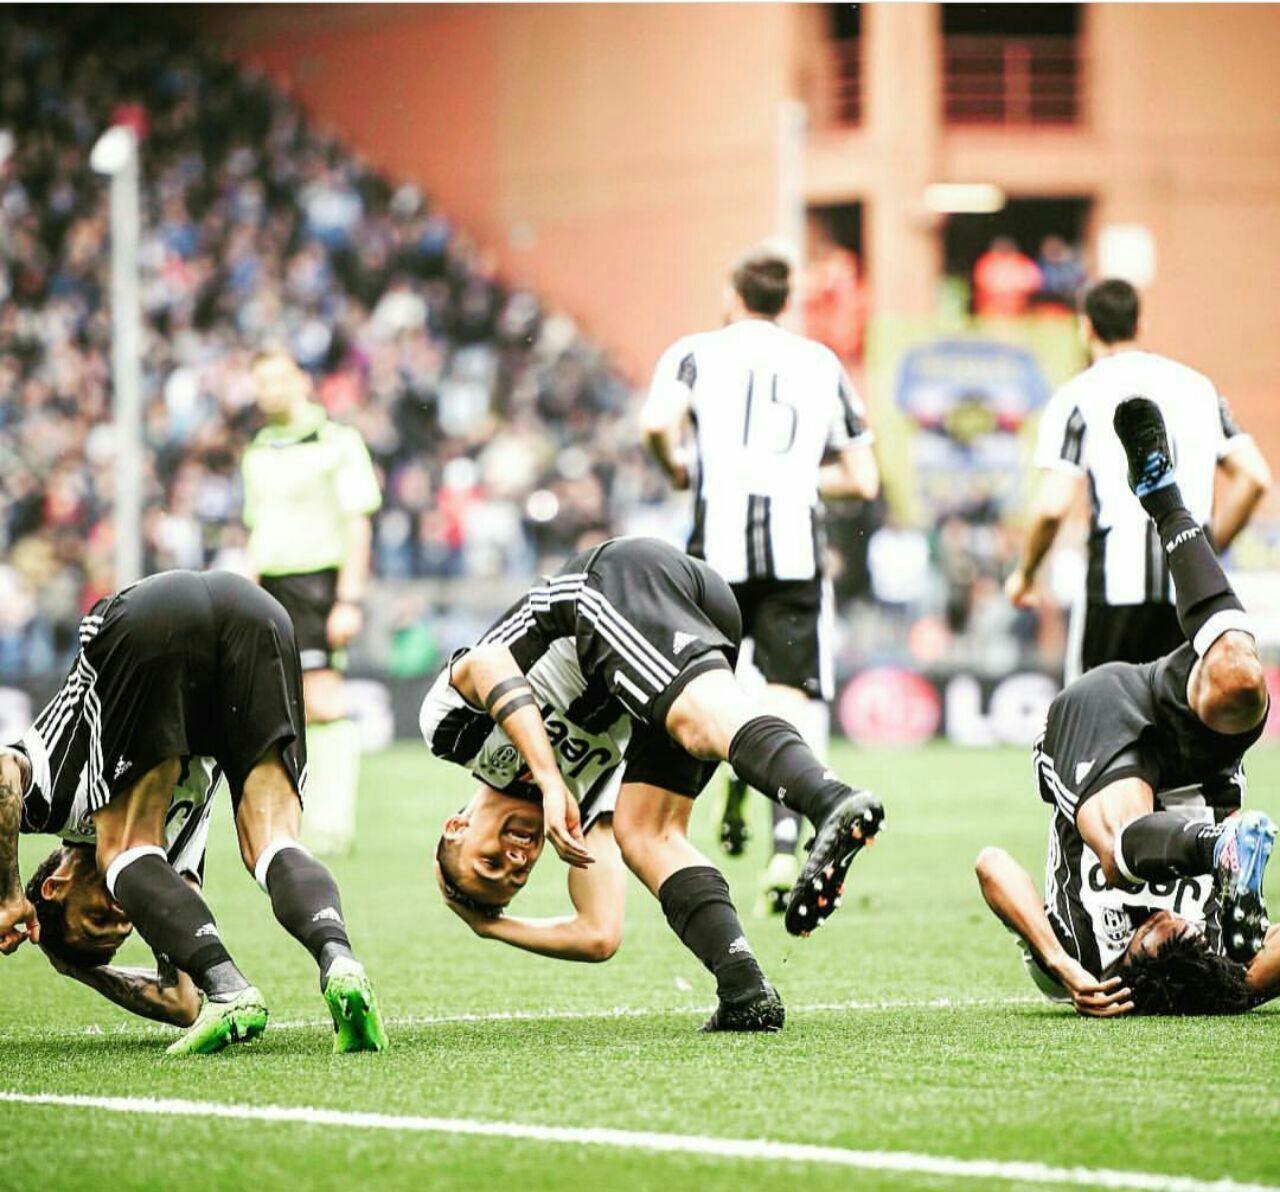 عکس | شادی جالب بازیکنان یوونتوس بعد از گلزنی مقابل سامپدوریا